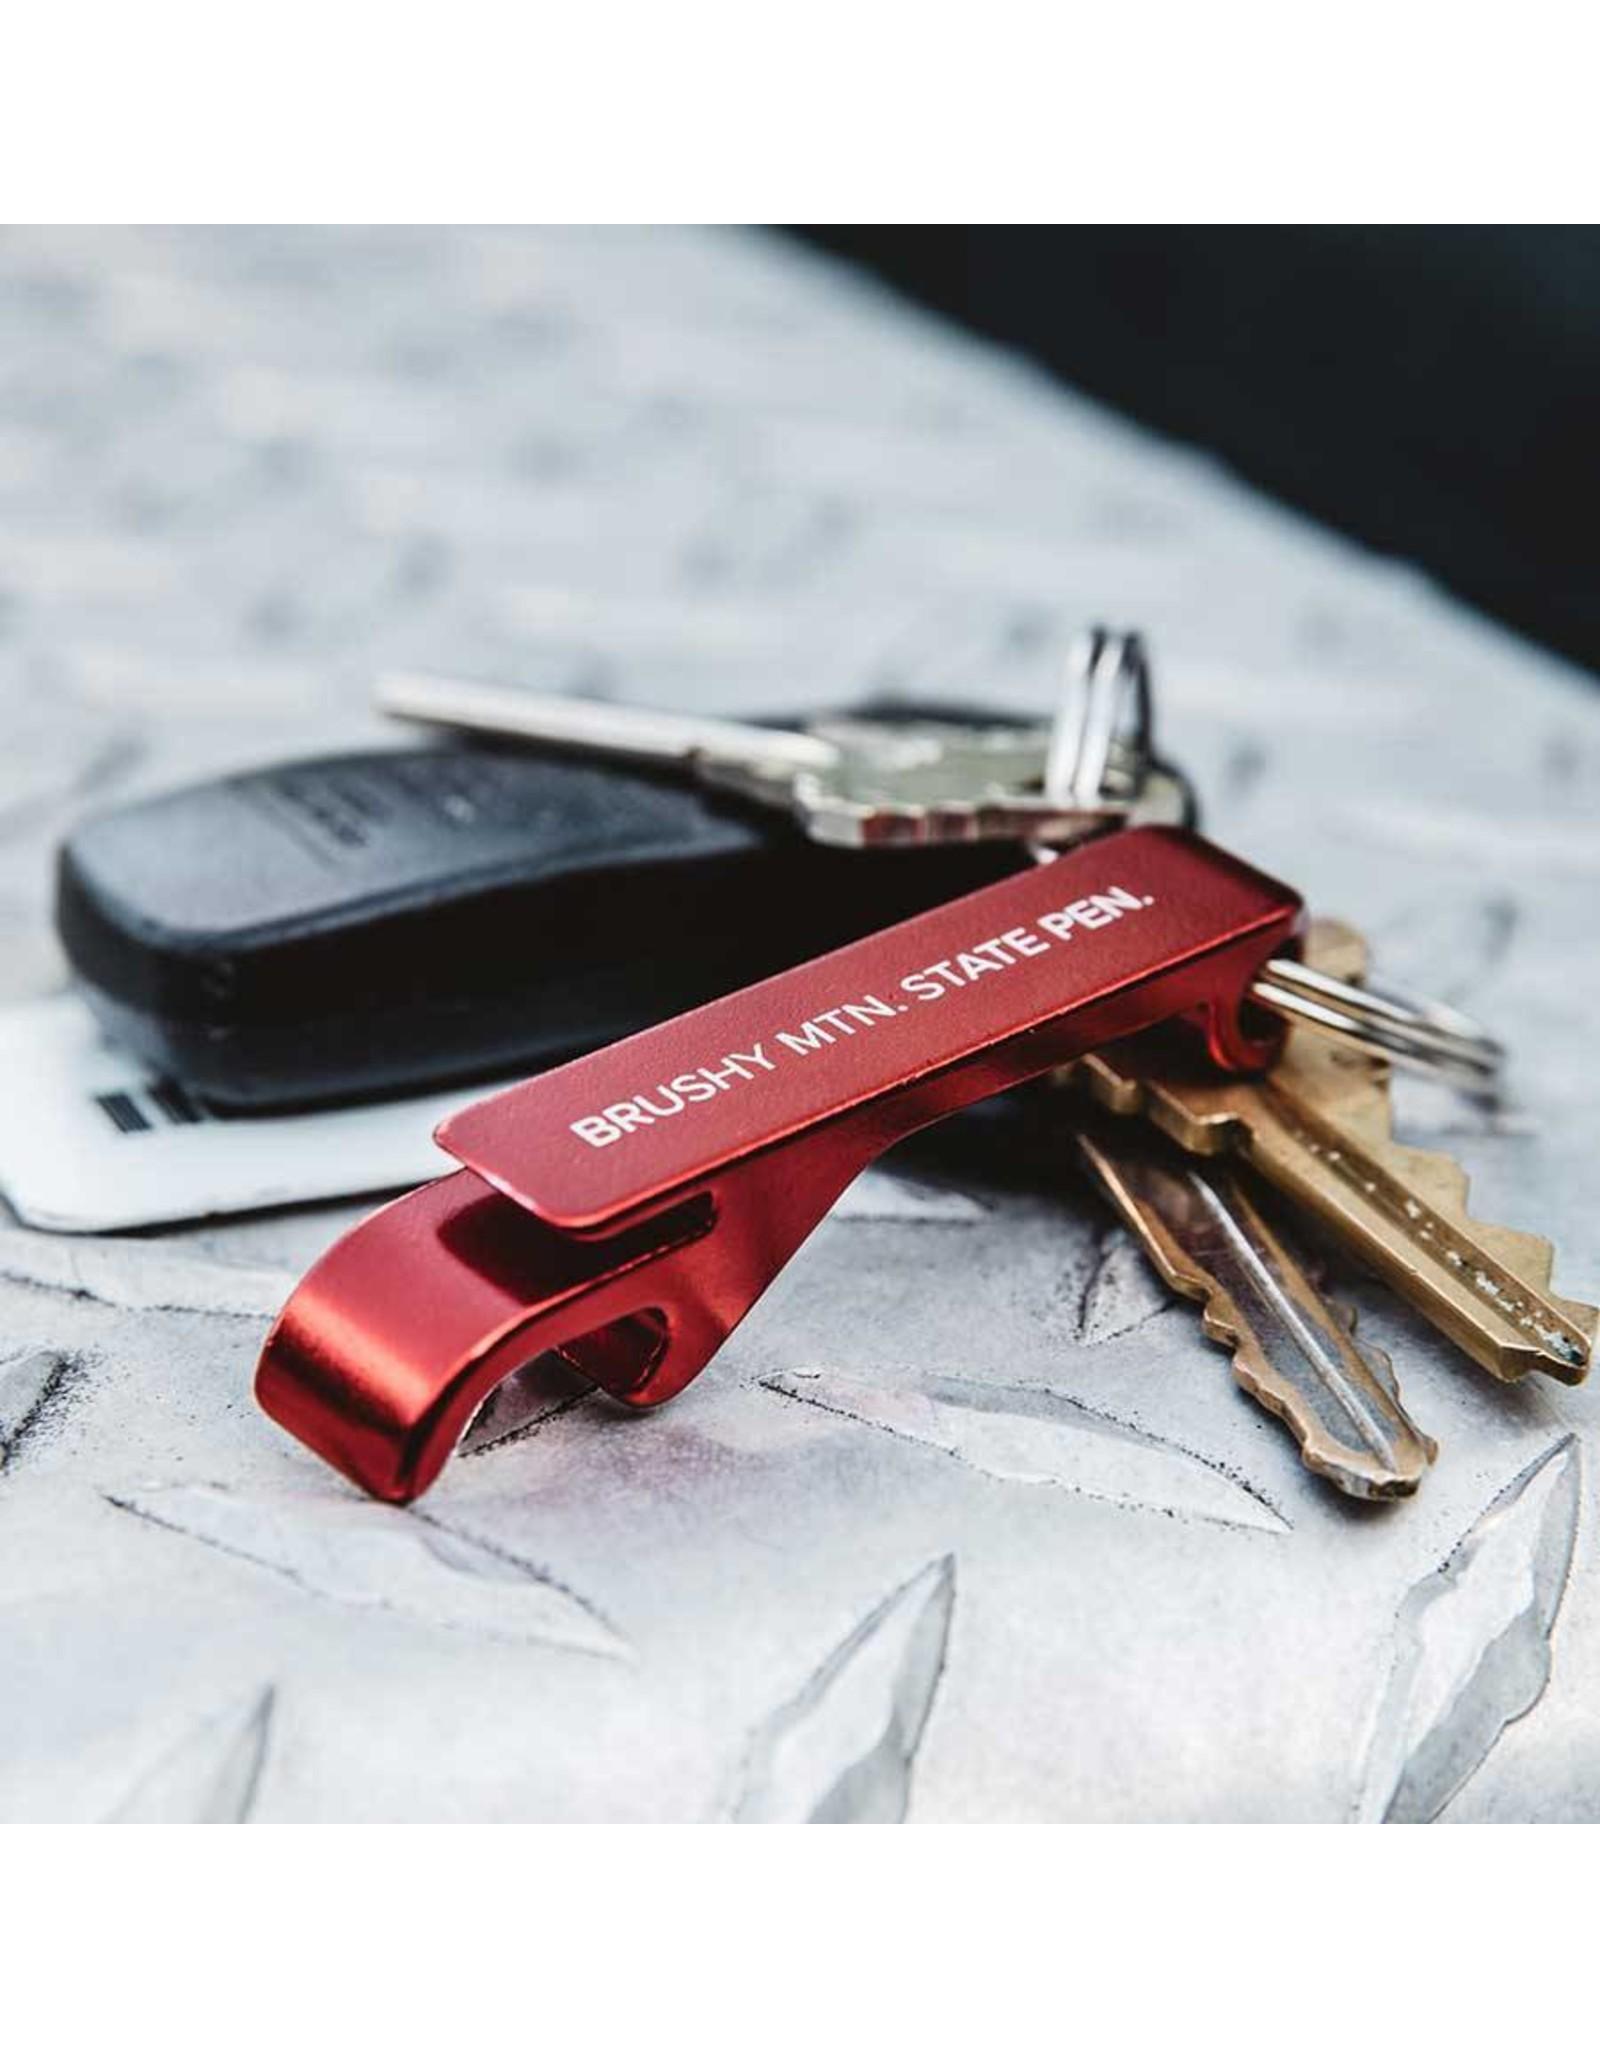 Historic Brushy Aluminum Bottle Opener Key Chain Brushy Key Chain Bottle Opener